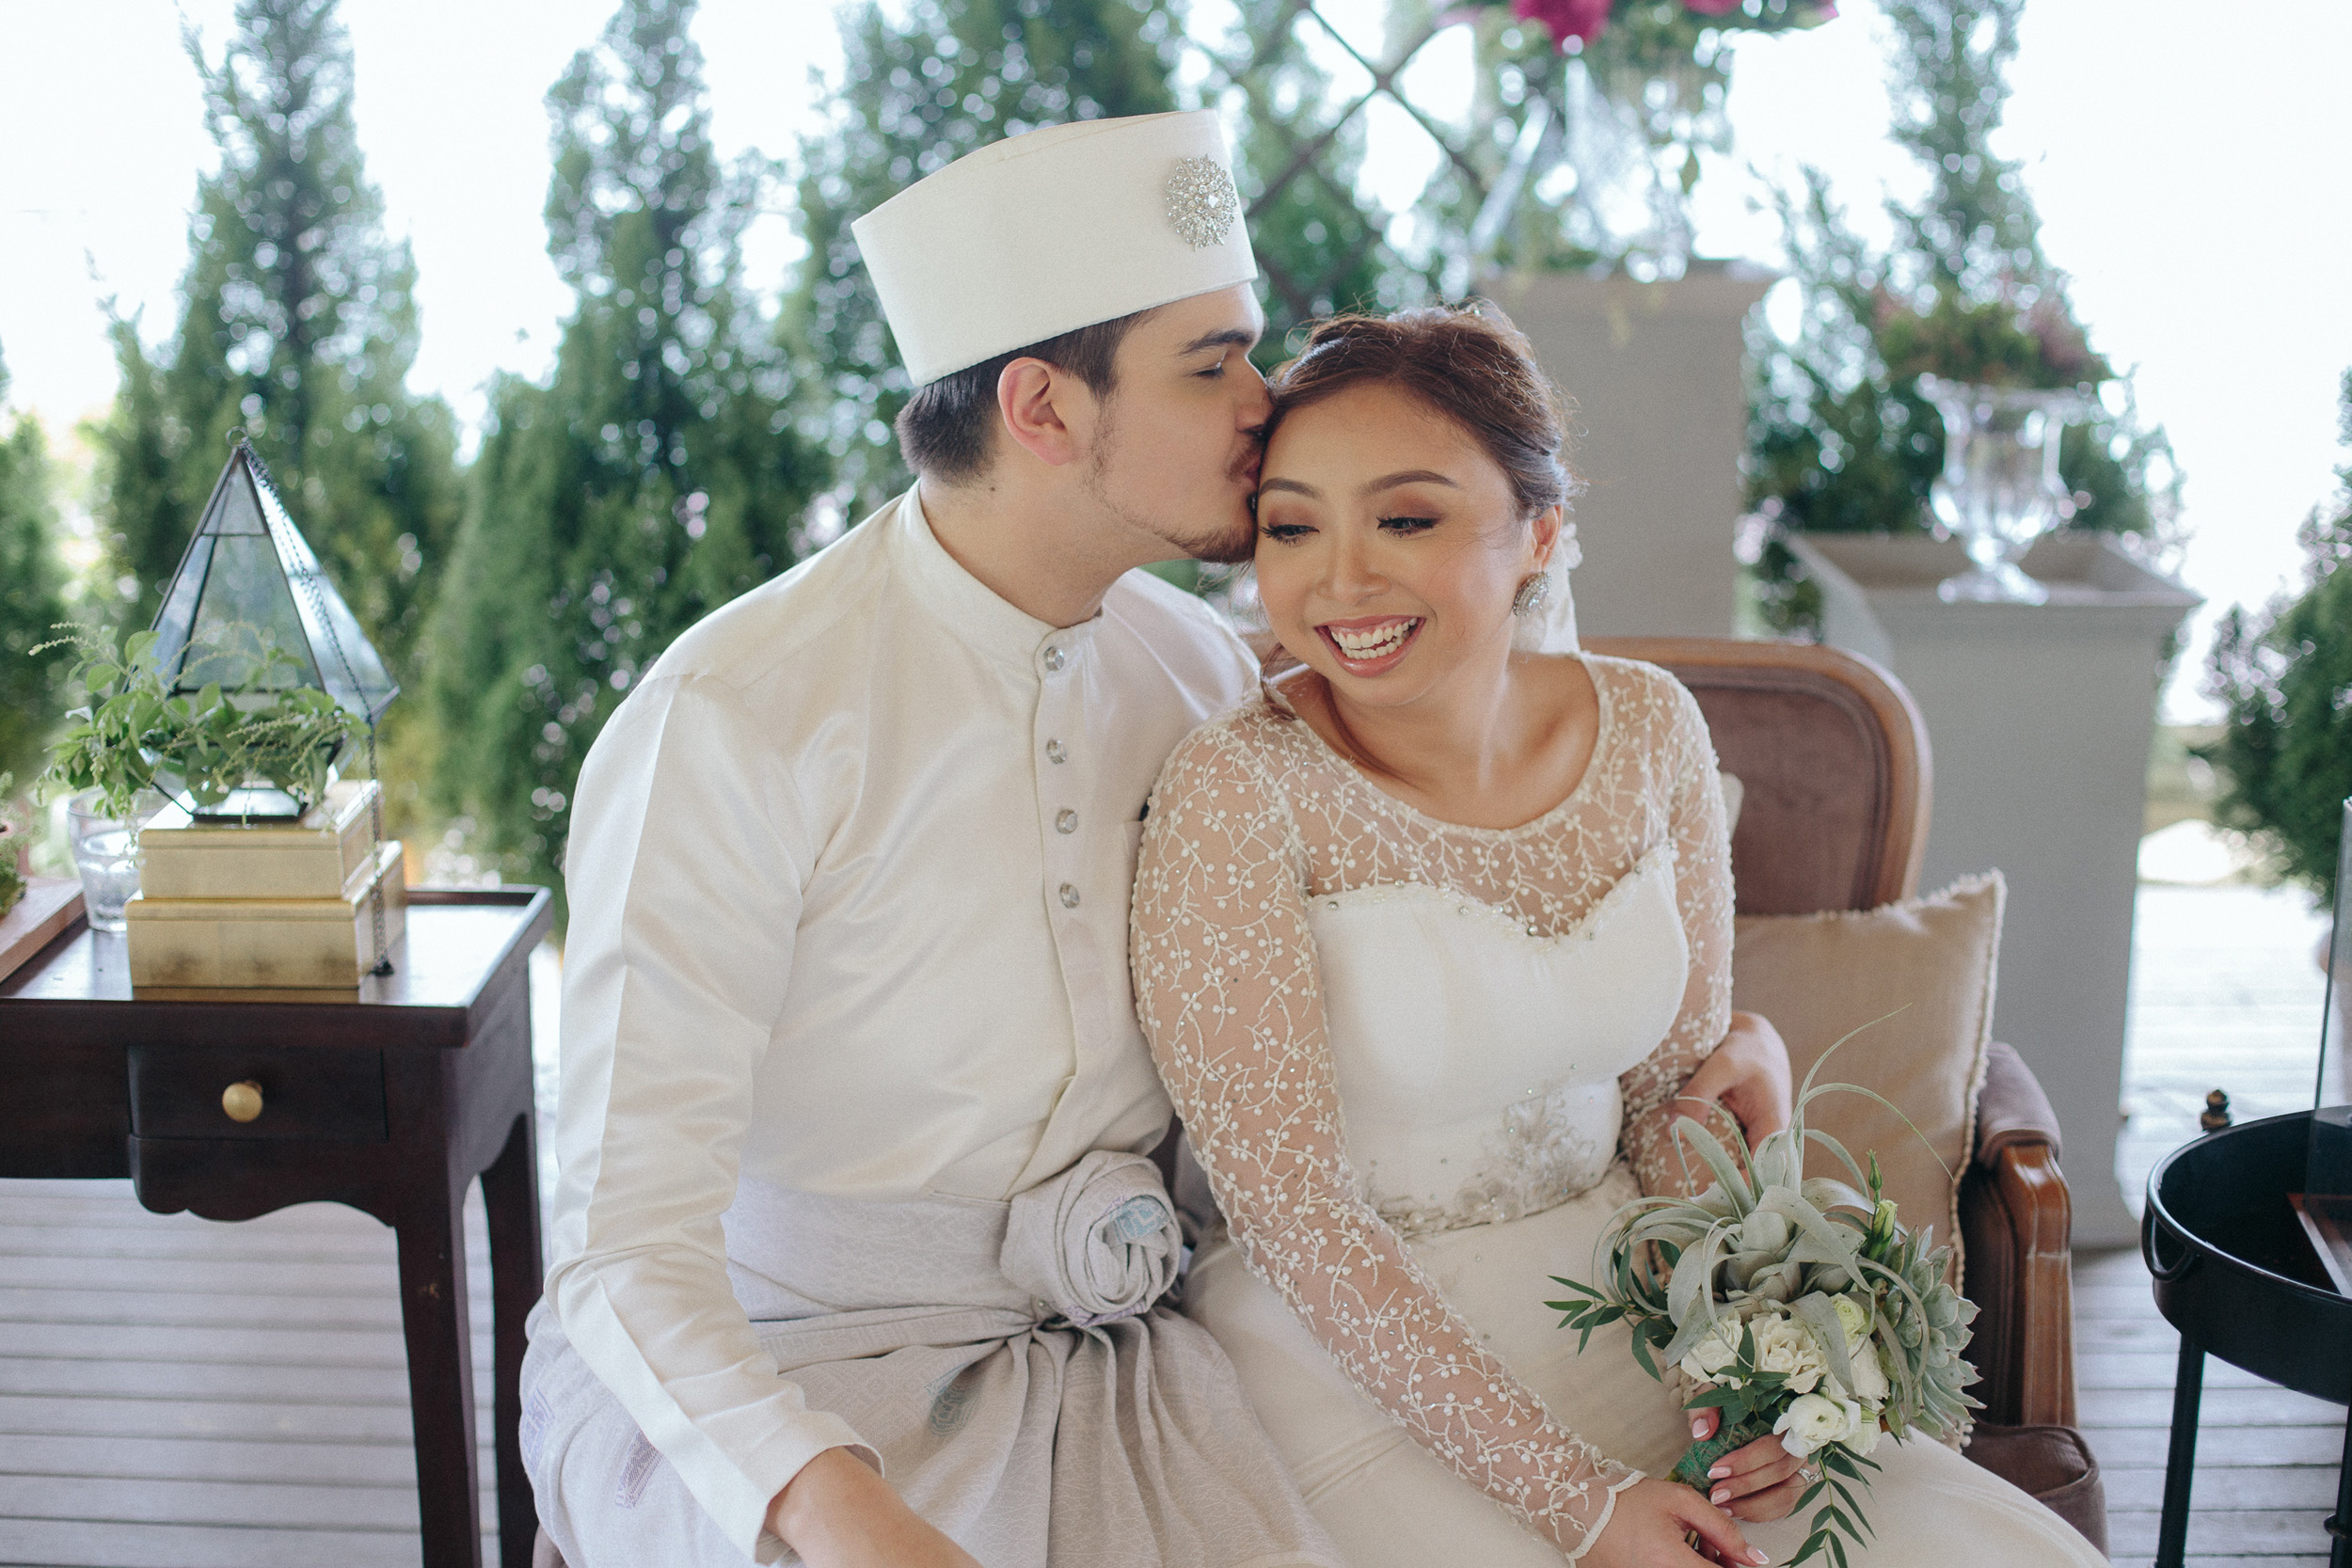 singapore-wedding-photographer-photography-wmt2017-114.jpg